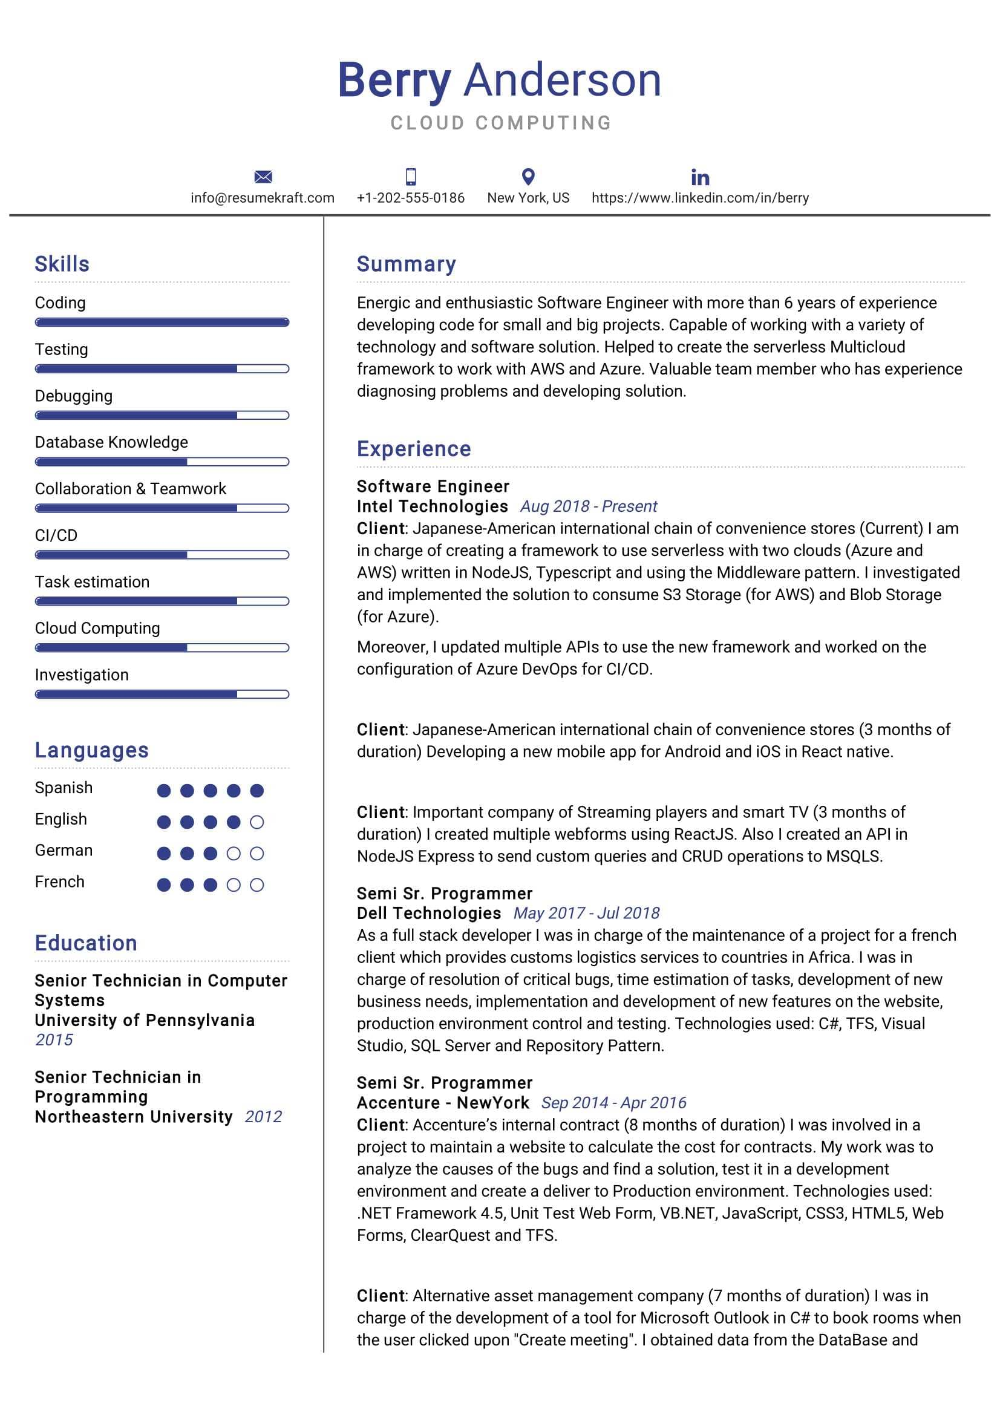 100 Professional Resume Samples For 2020 Resumekraft In 2020 Cloud Computing Professional Resume Samples Resume Examples